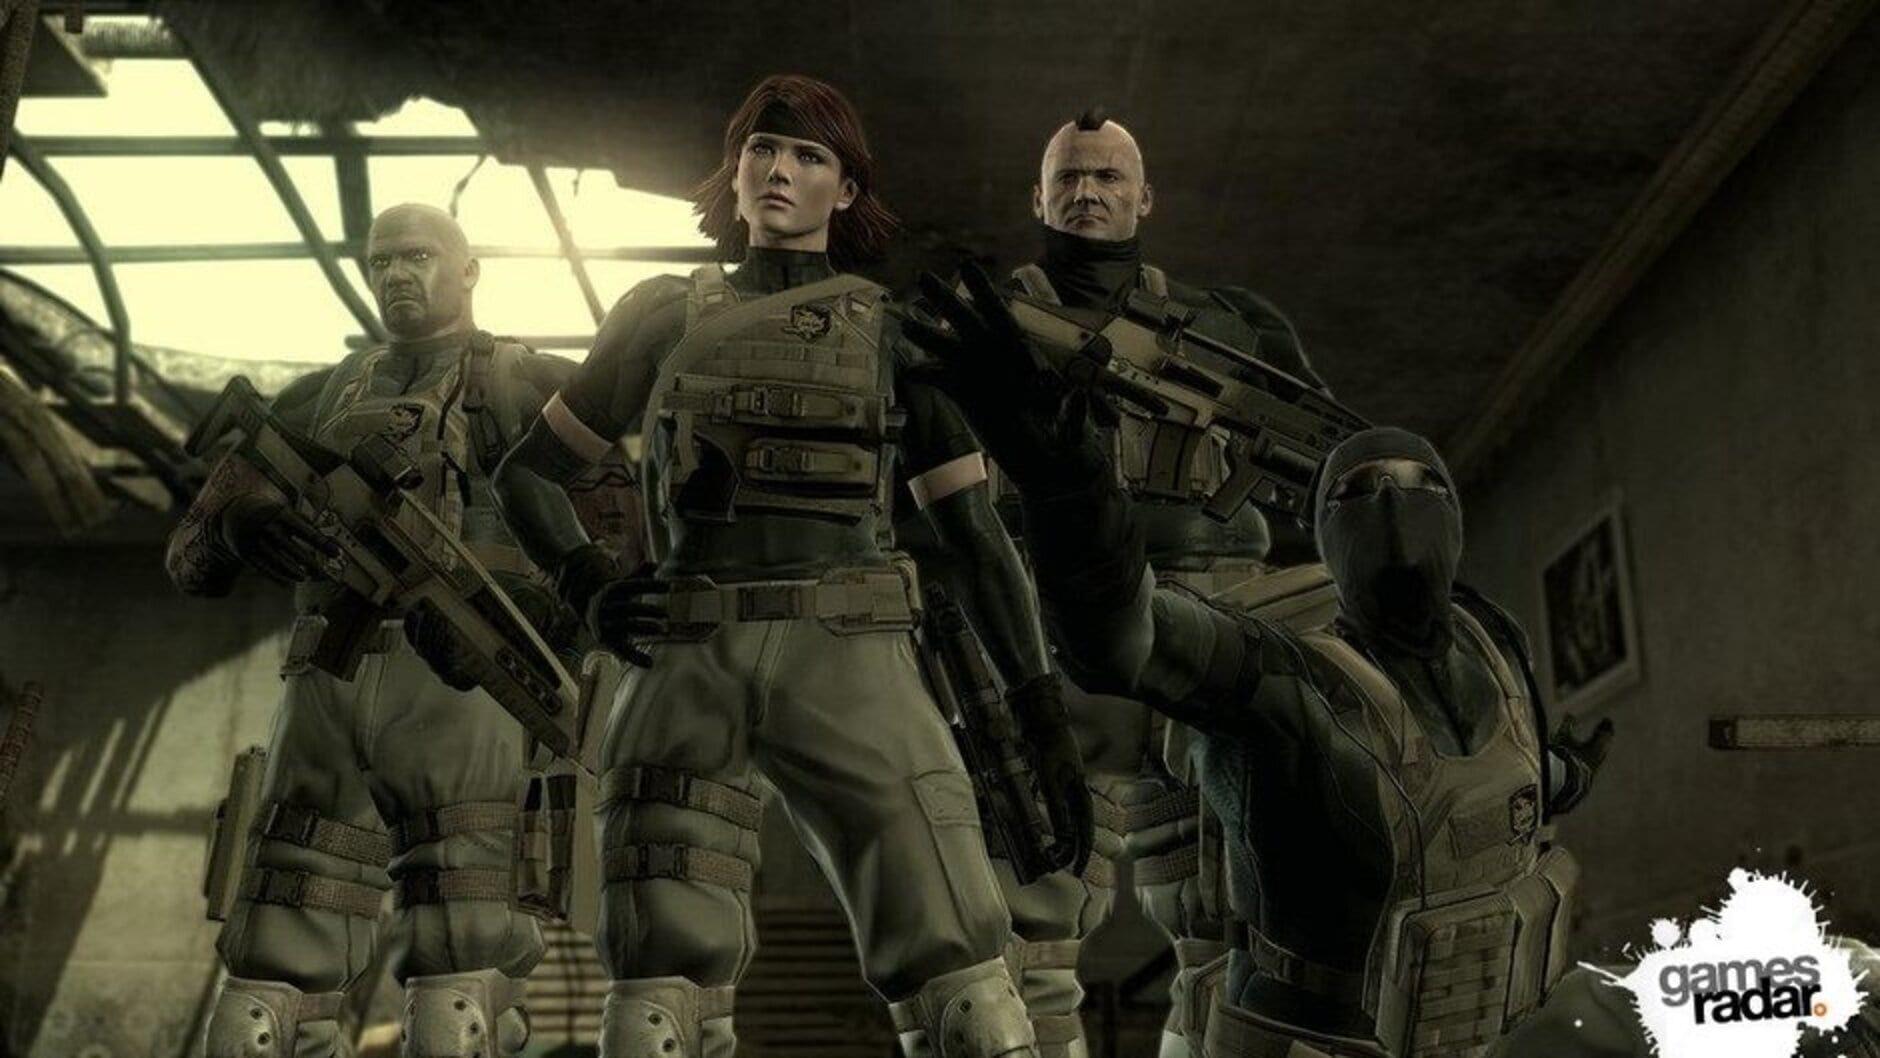 Metal Gear Solid 4: Guns of the Patriots - 4